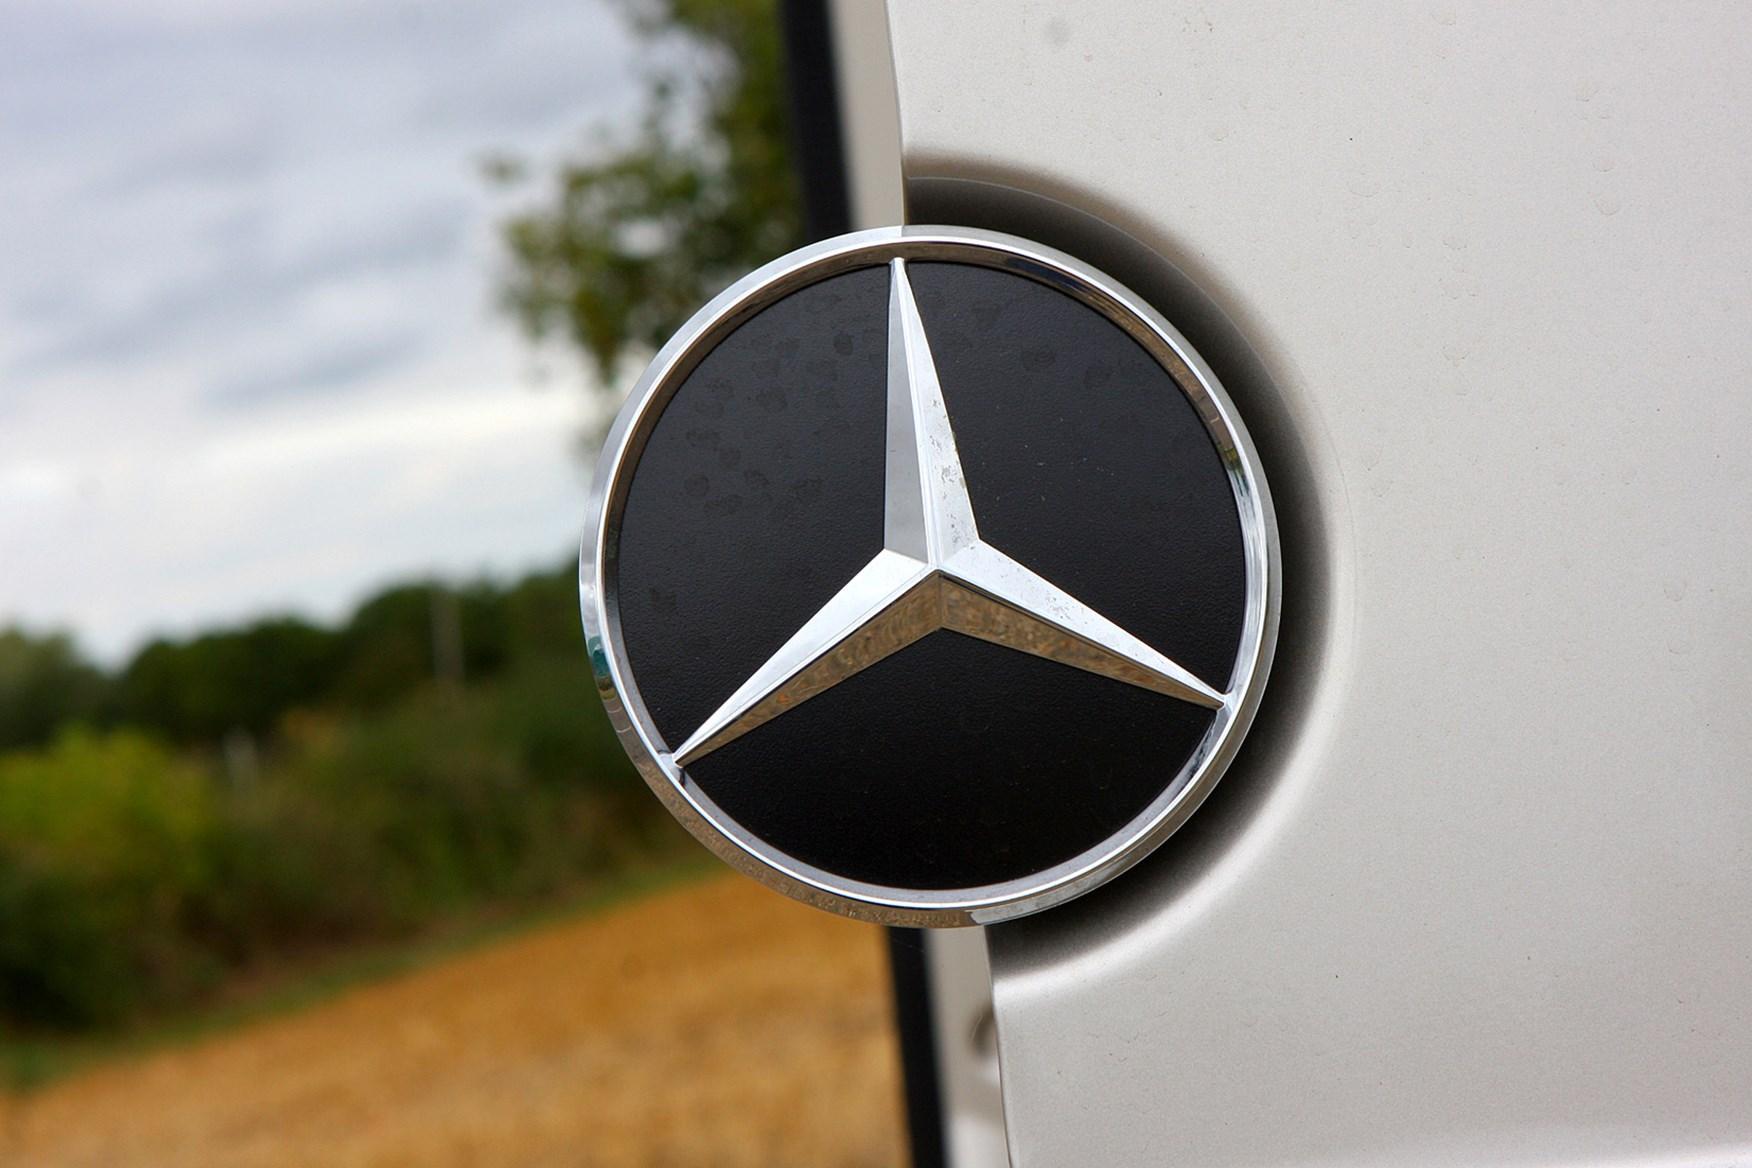 Mercedes-Benz Sprinter full review on Parkers Vans - Mercedes-Benz detail